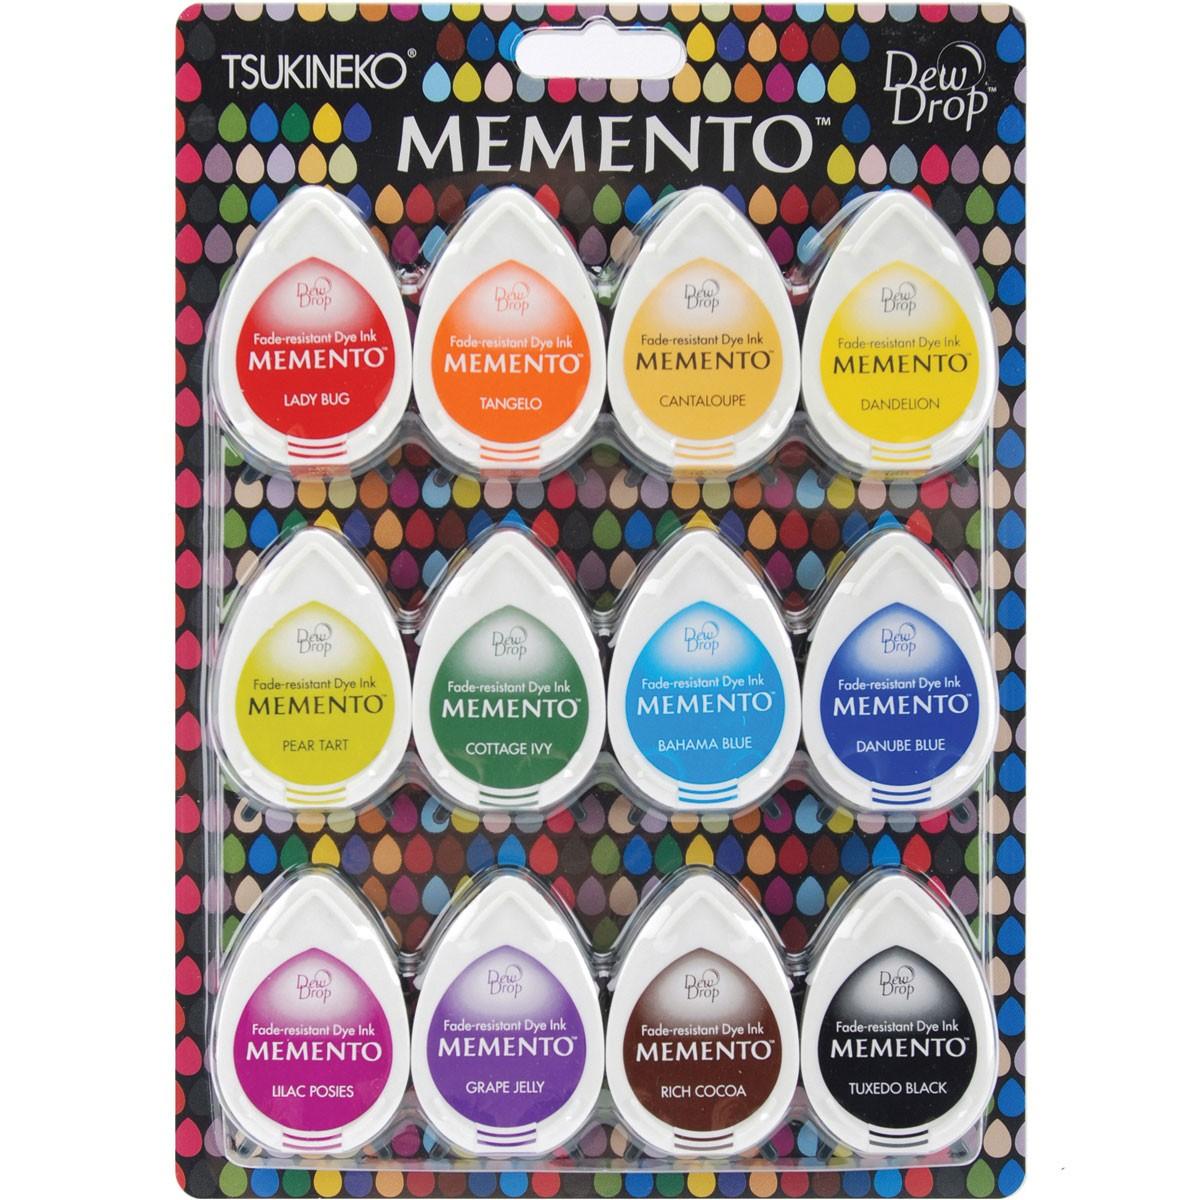 Memento Dew Drops - gumdrops